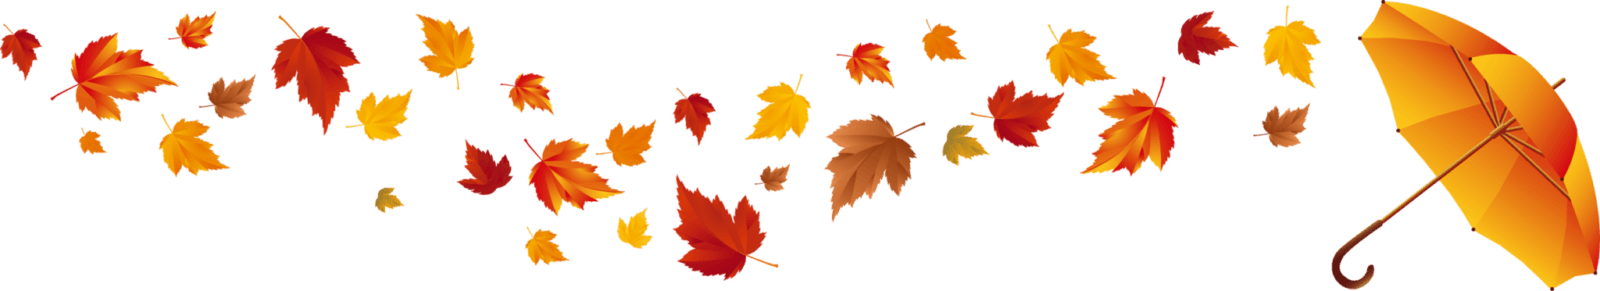 Осенний листопад цен Самогонщицы